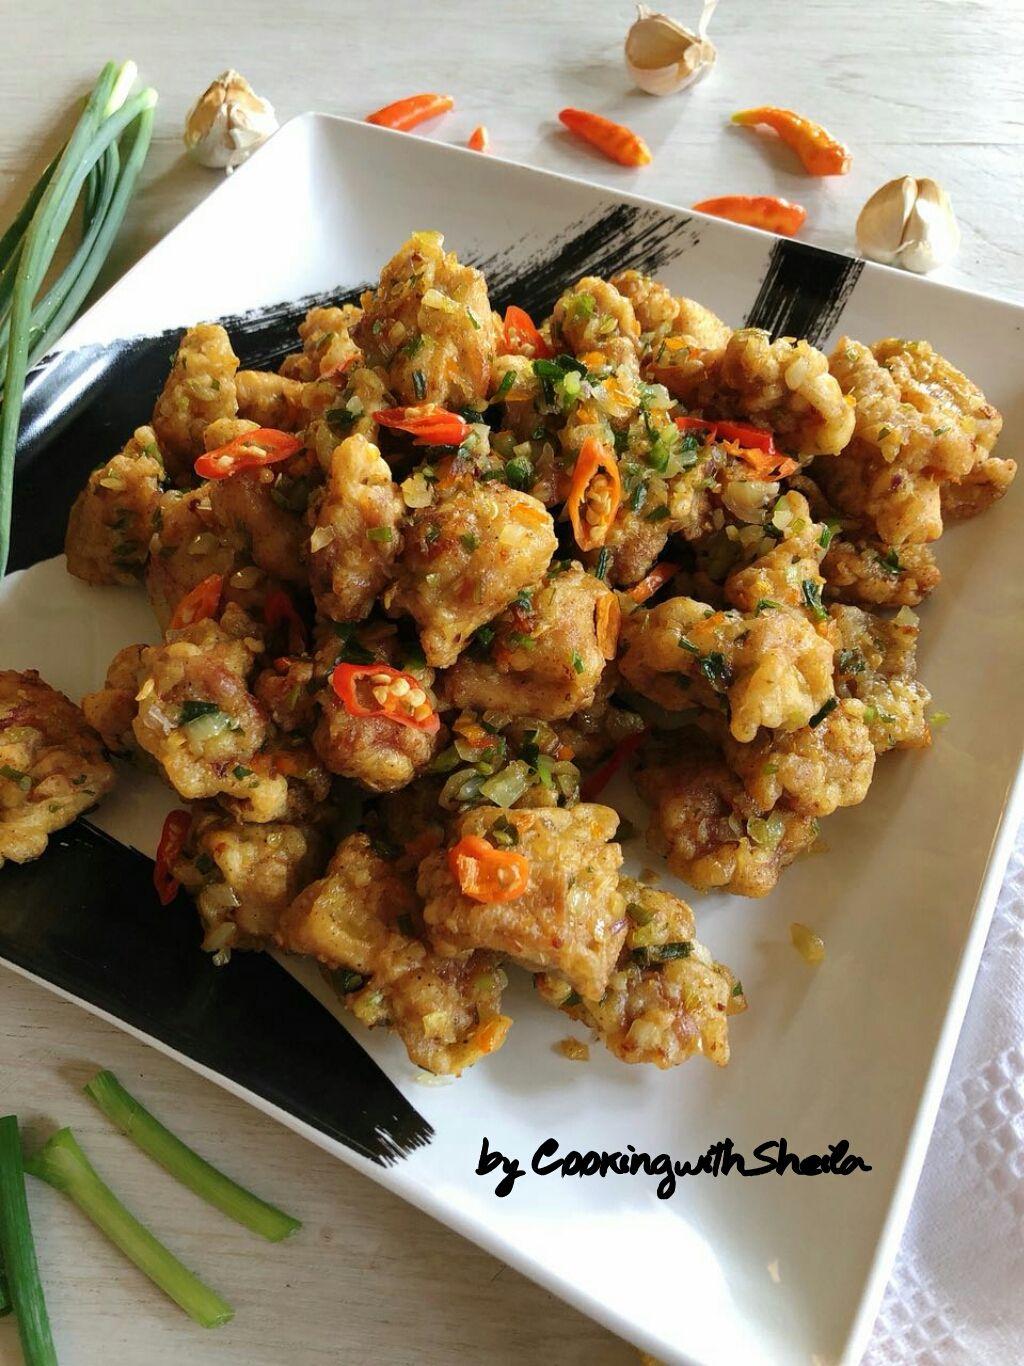 Menu Makan Siang Keluarga Saya Hari Ini Ayam Goreng Cabai Garam Menu Chinese Favorit Diberi Sebutan Cabai Garam K Resep Ayam Makan Siang Resep Makan Malam